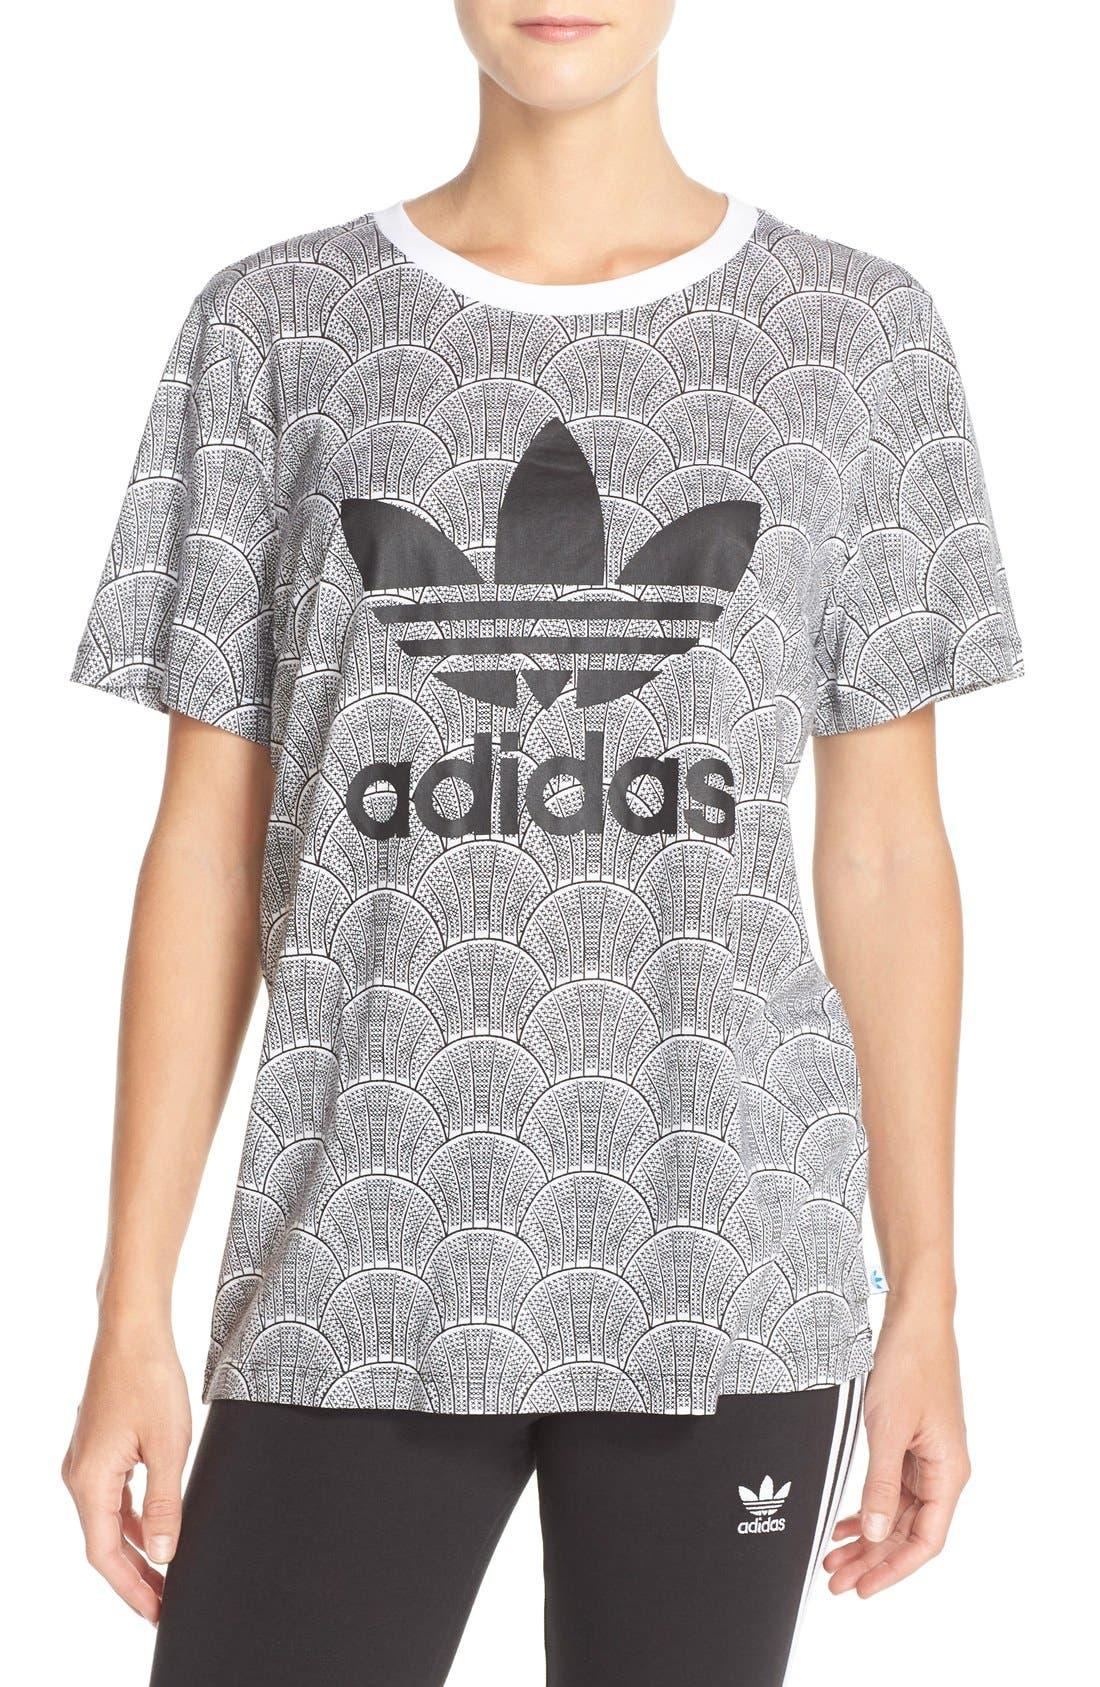 Alternate Image 1 Selected - adidas Originals 'Shell Tile' Boyfriend Tee